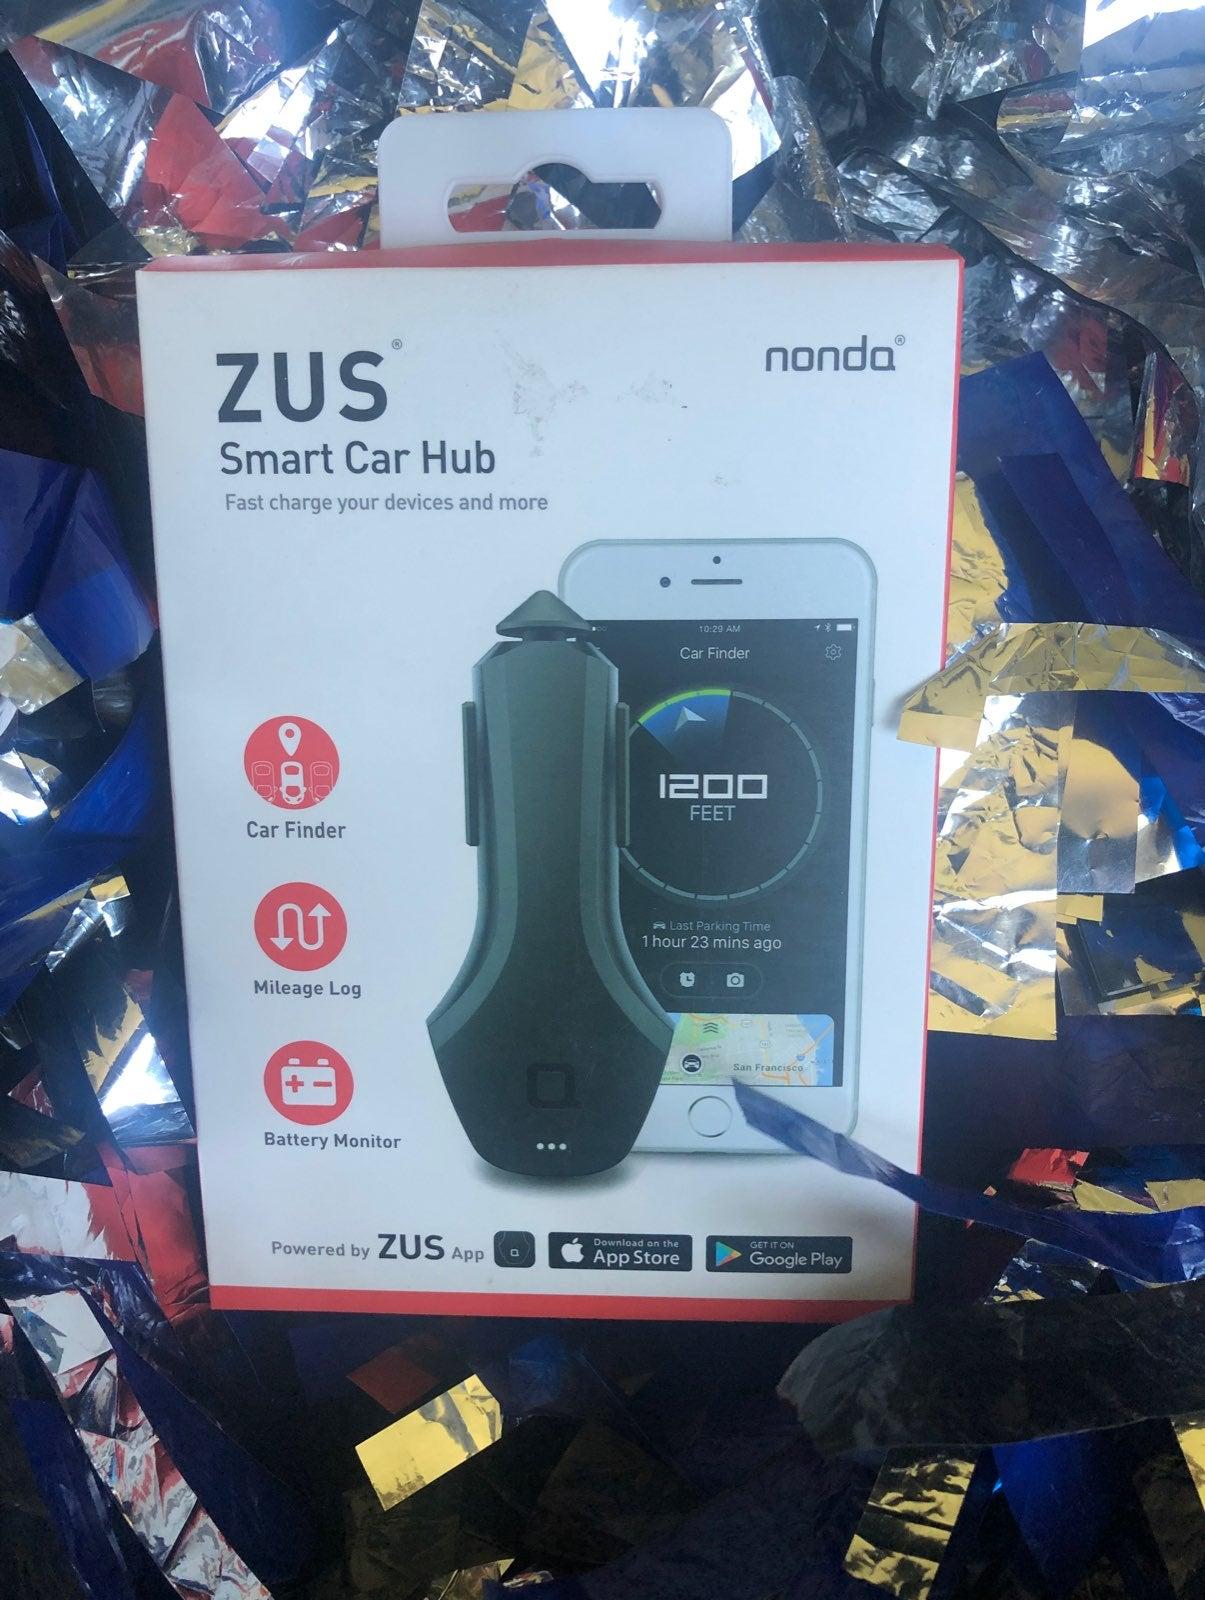 ZUS Smart Car Hub